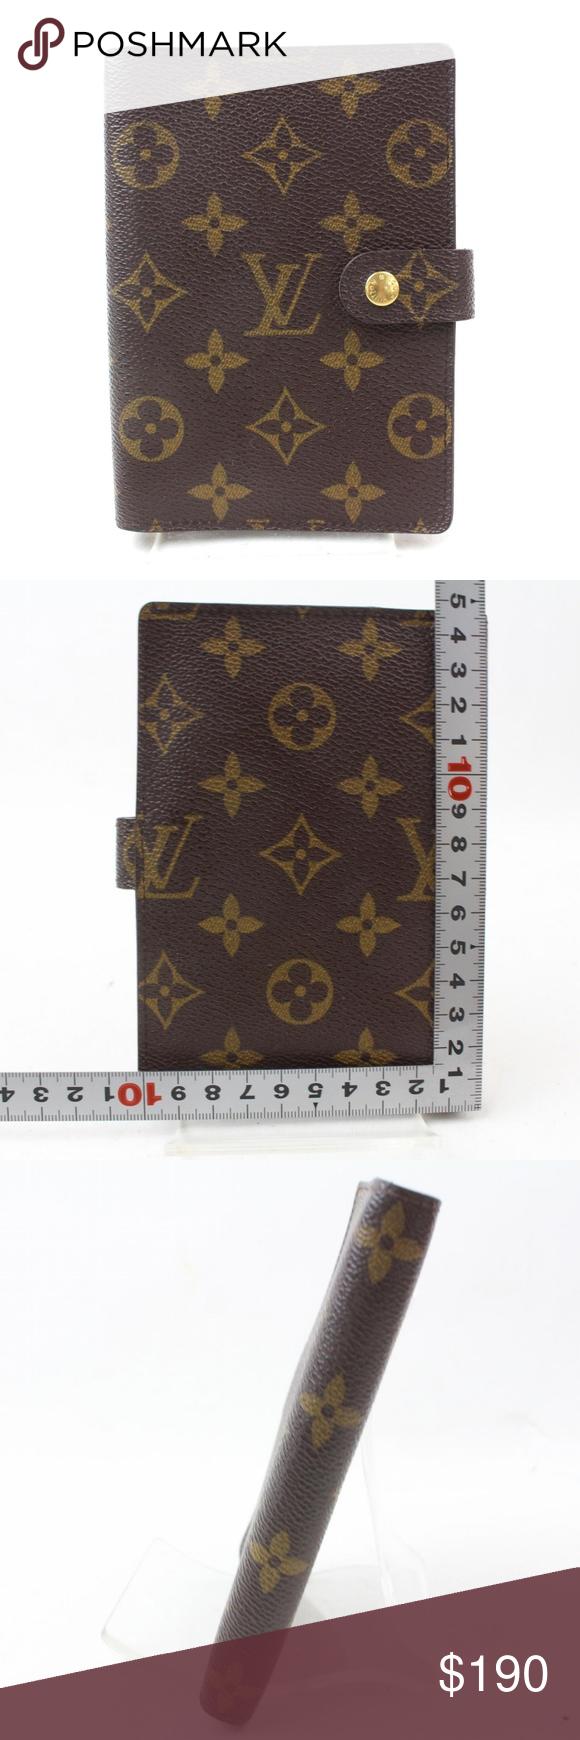 Auth Louis Vuitton Diary Cover Agenda Pm 200lw69 Agendas